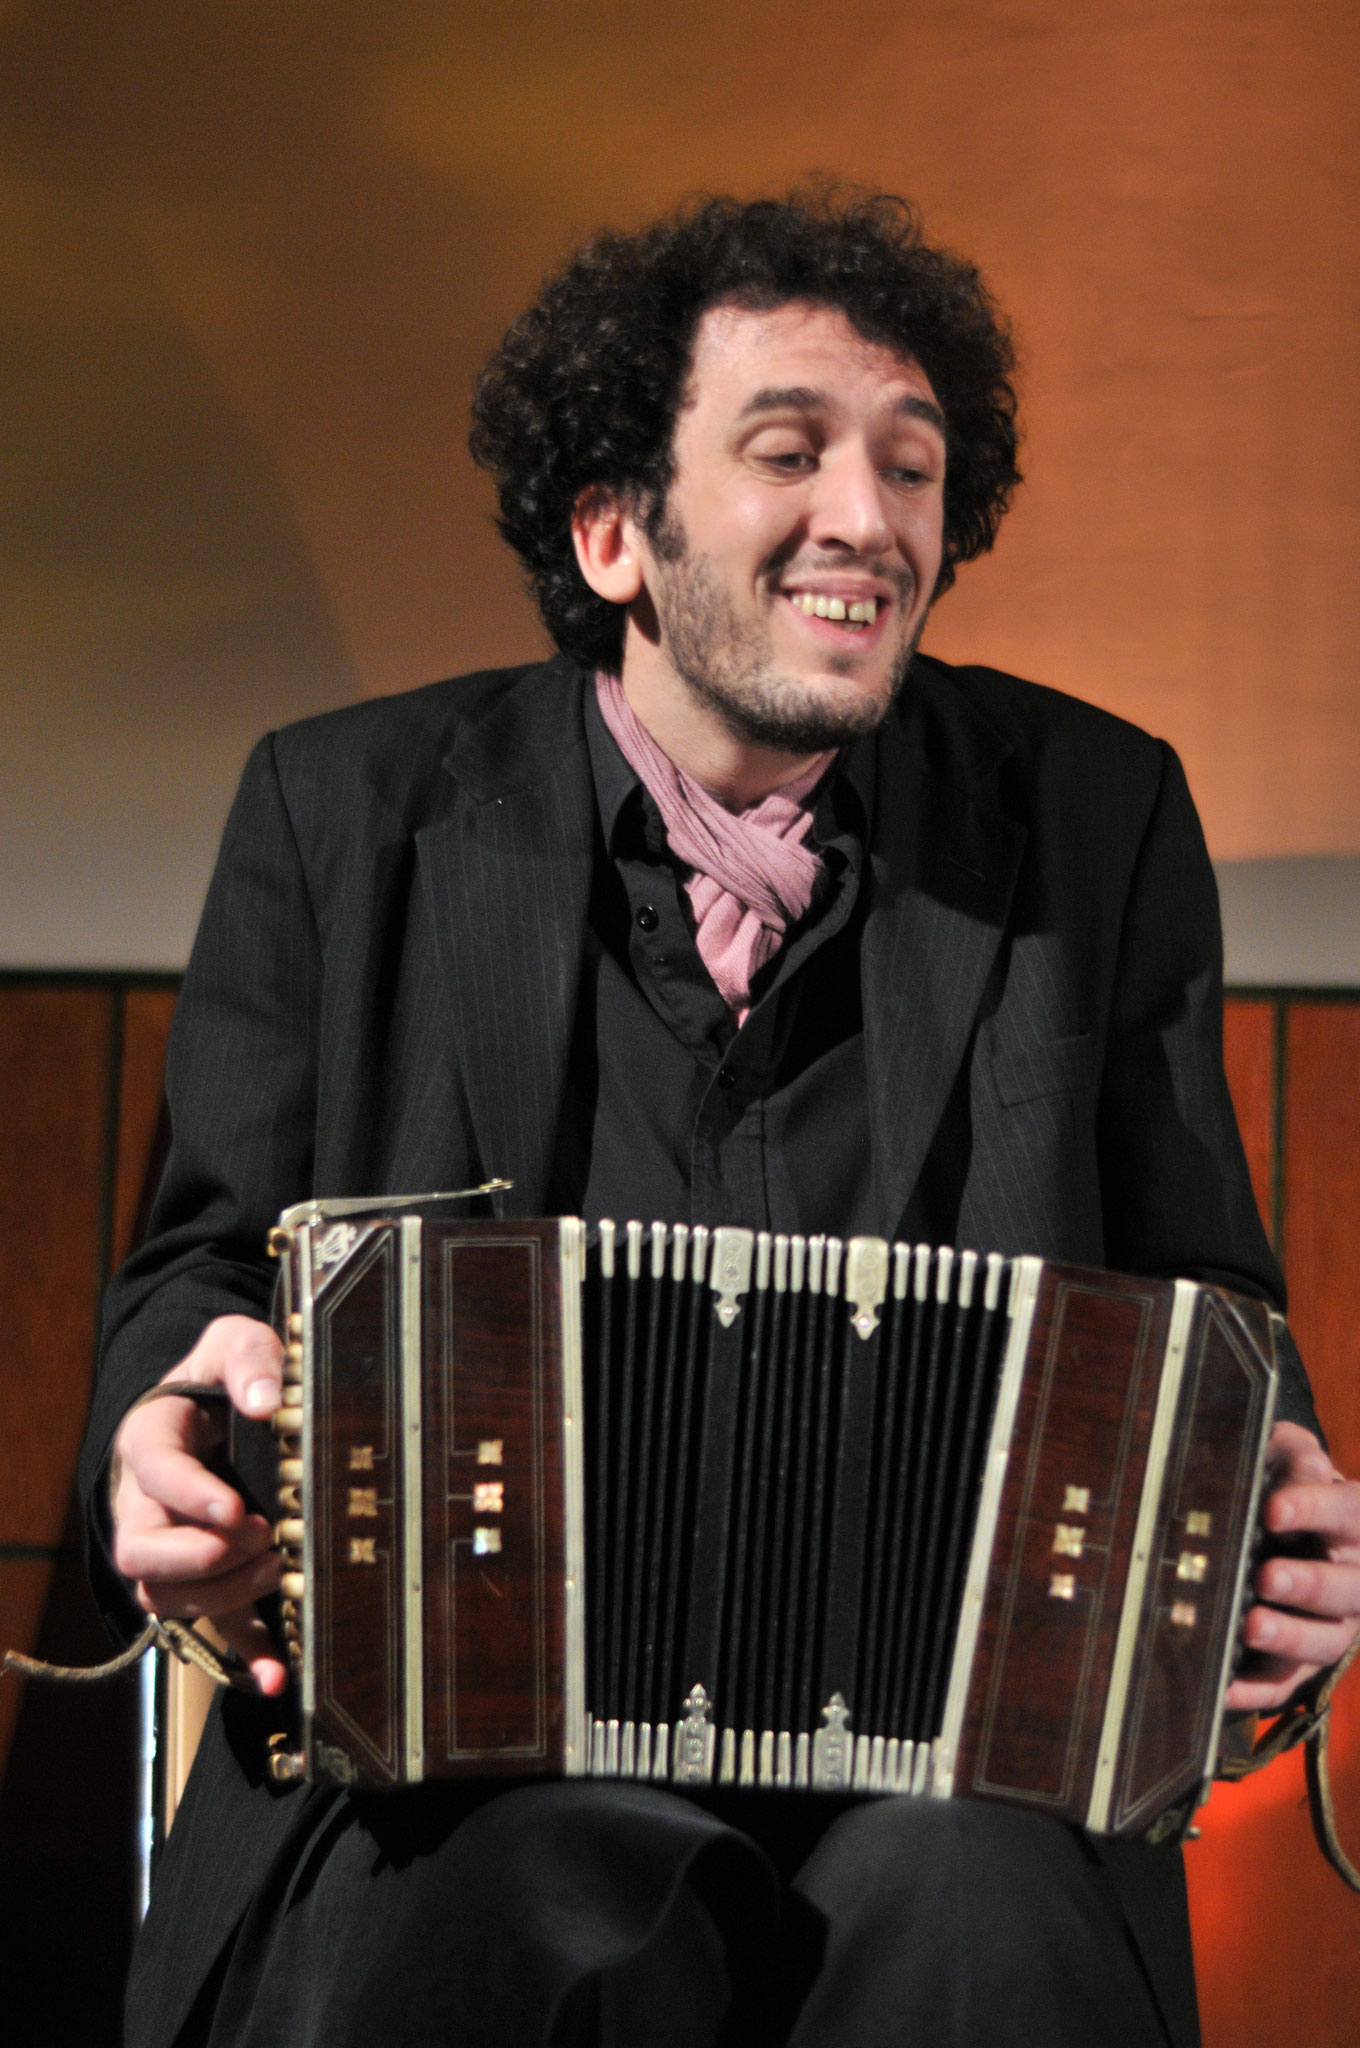 Leandro vom Duo Ranas 2010 (Foto Paul Clemens)